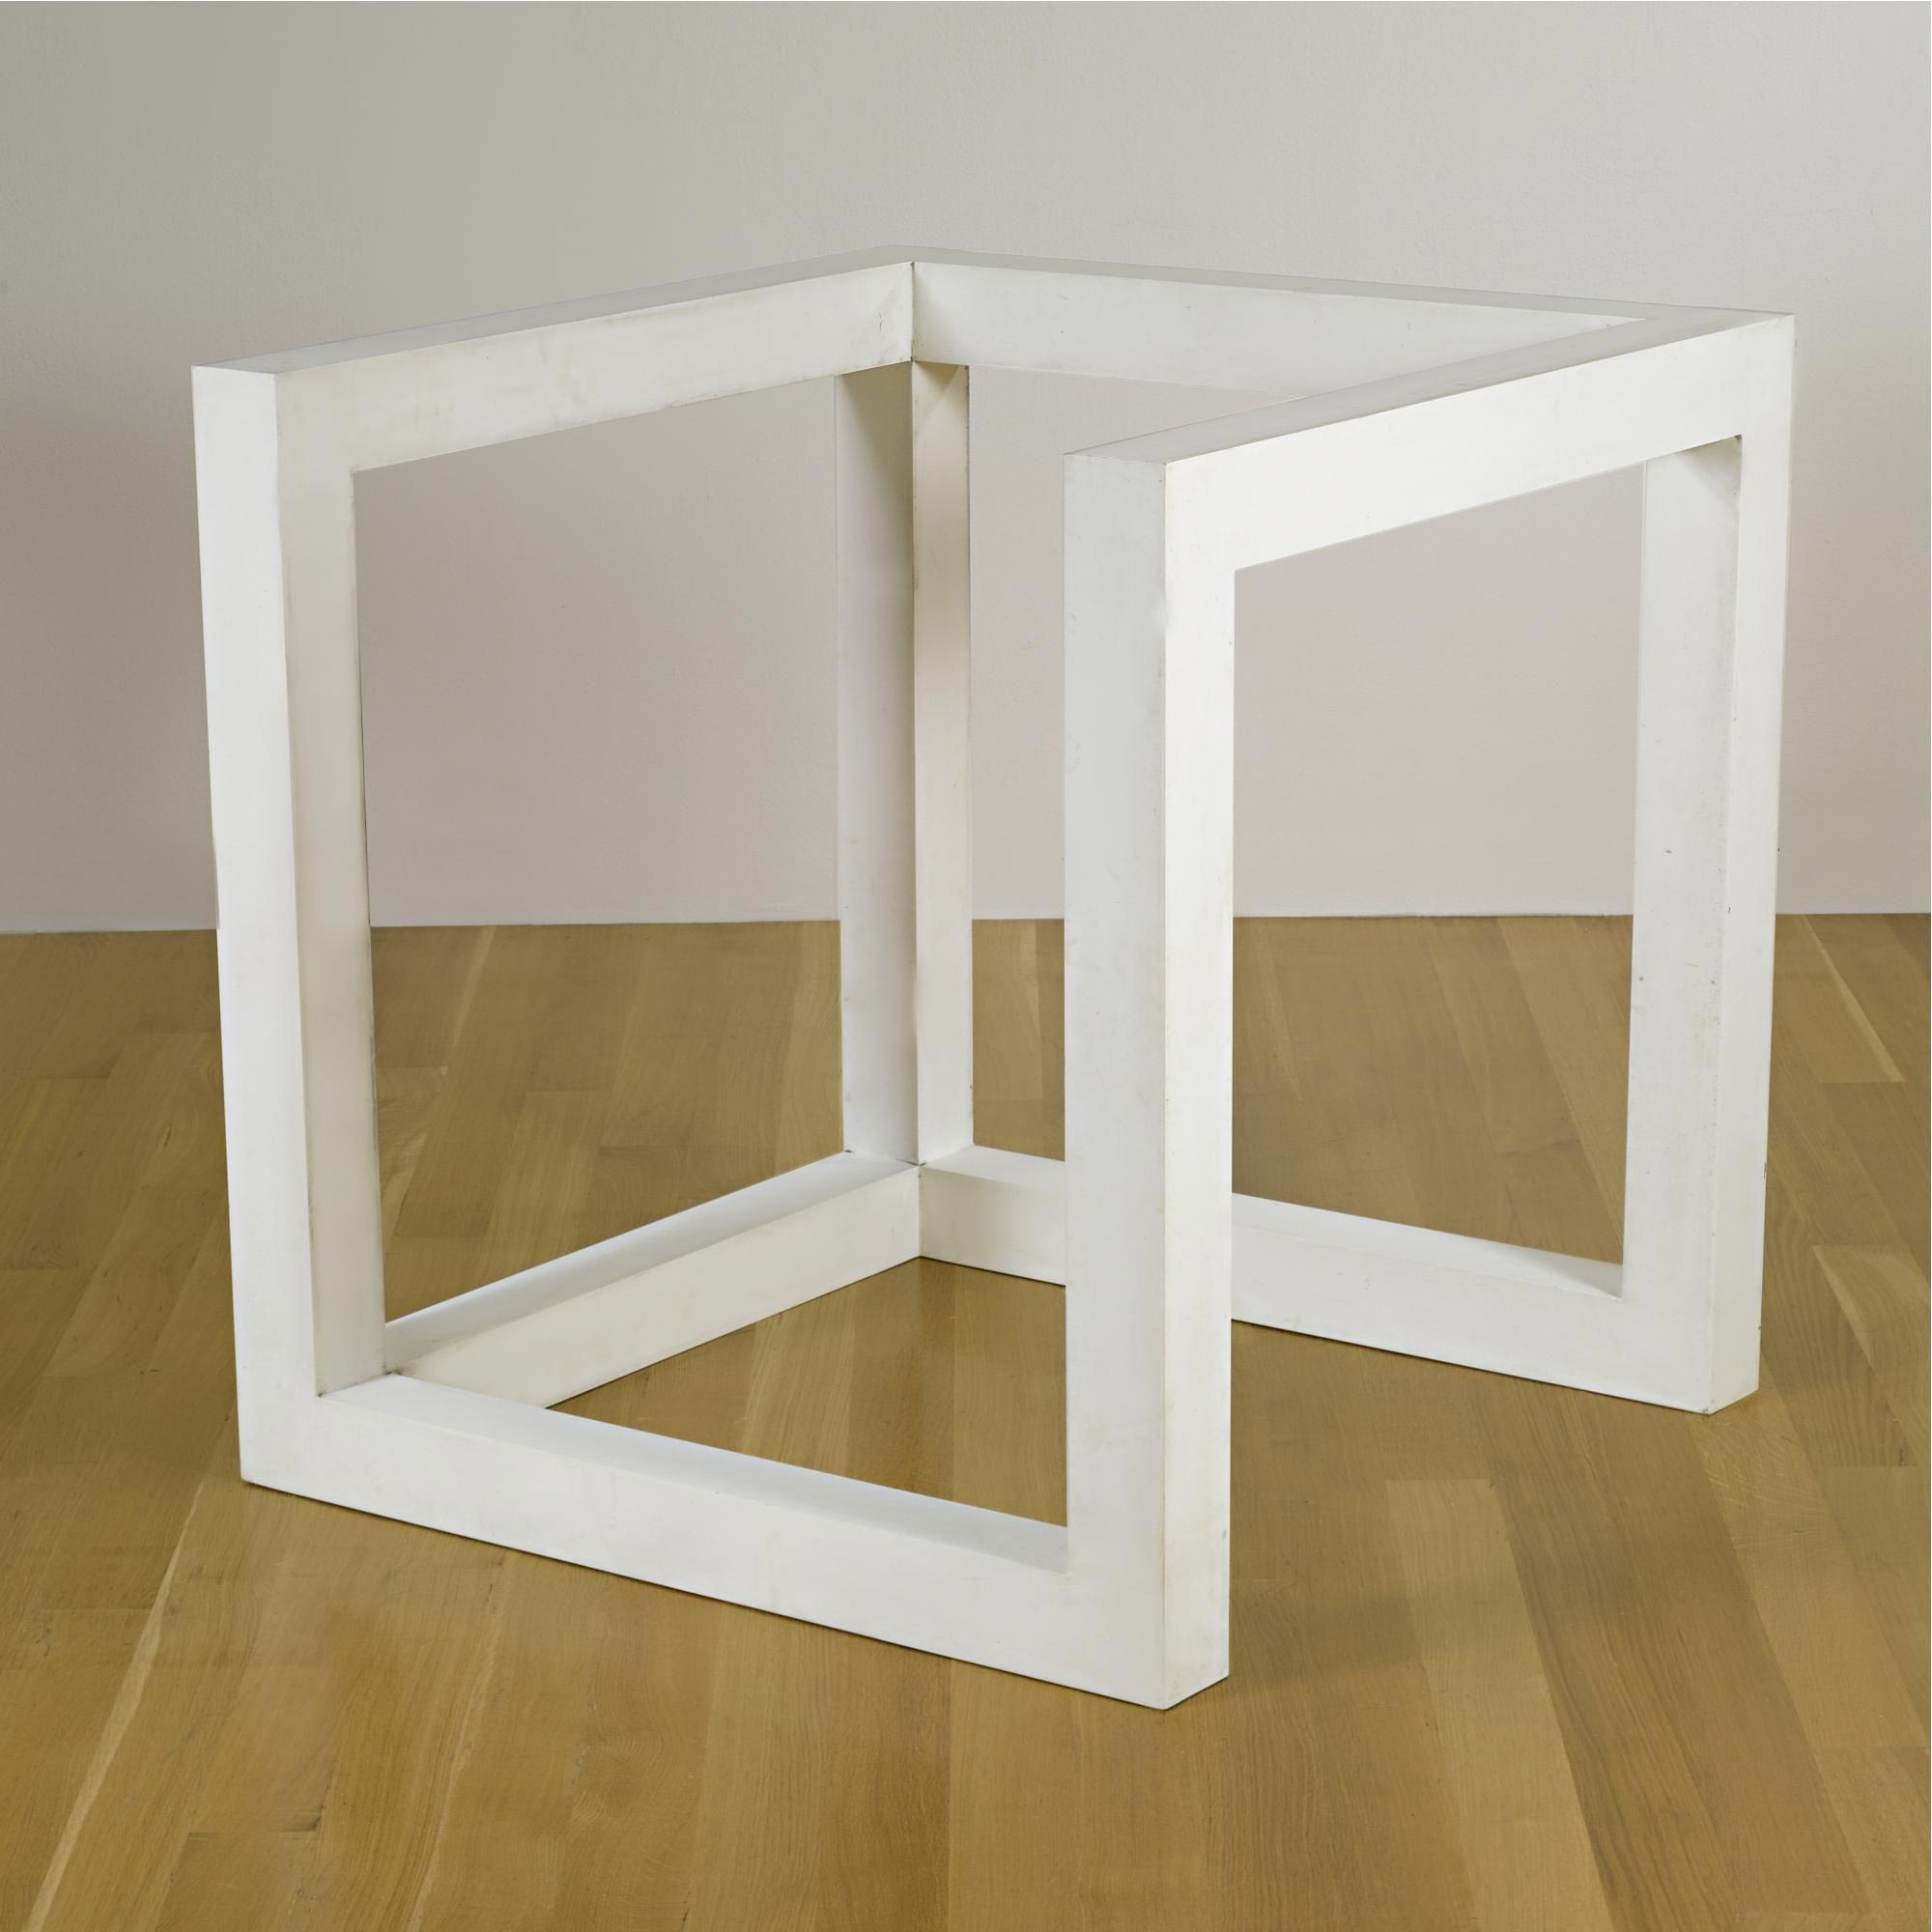 le-witt-incomplete-open-cubes-12